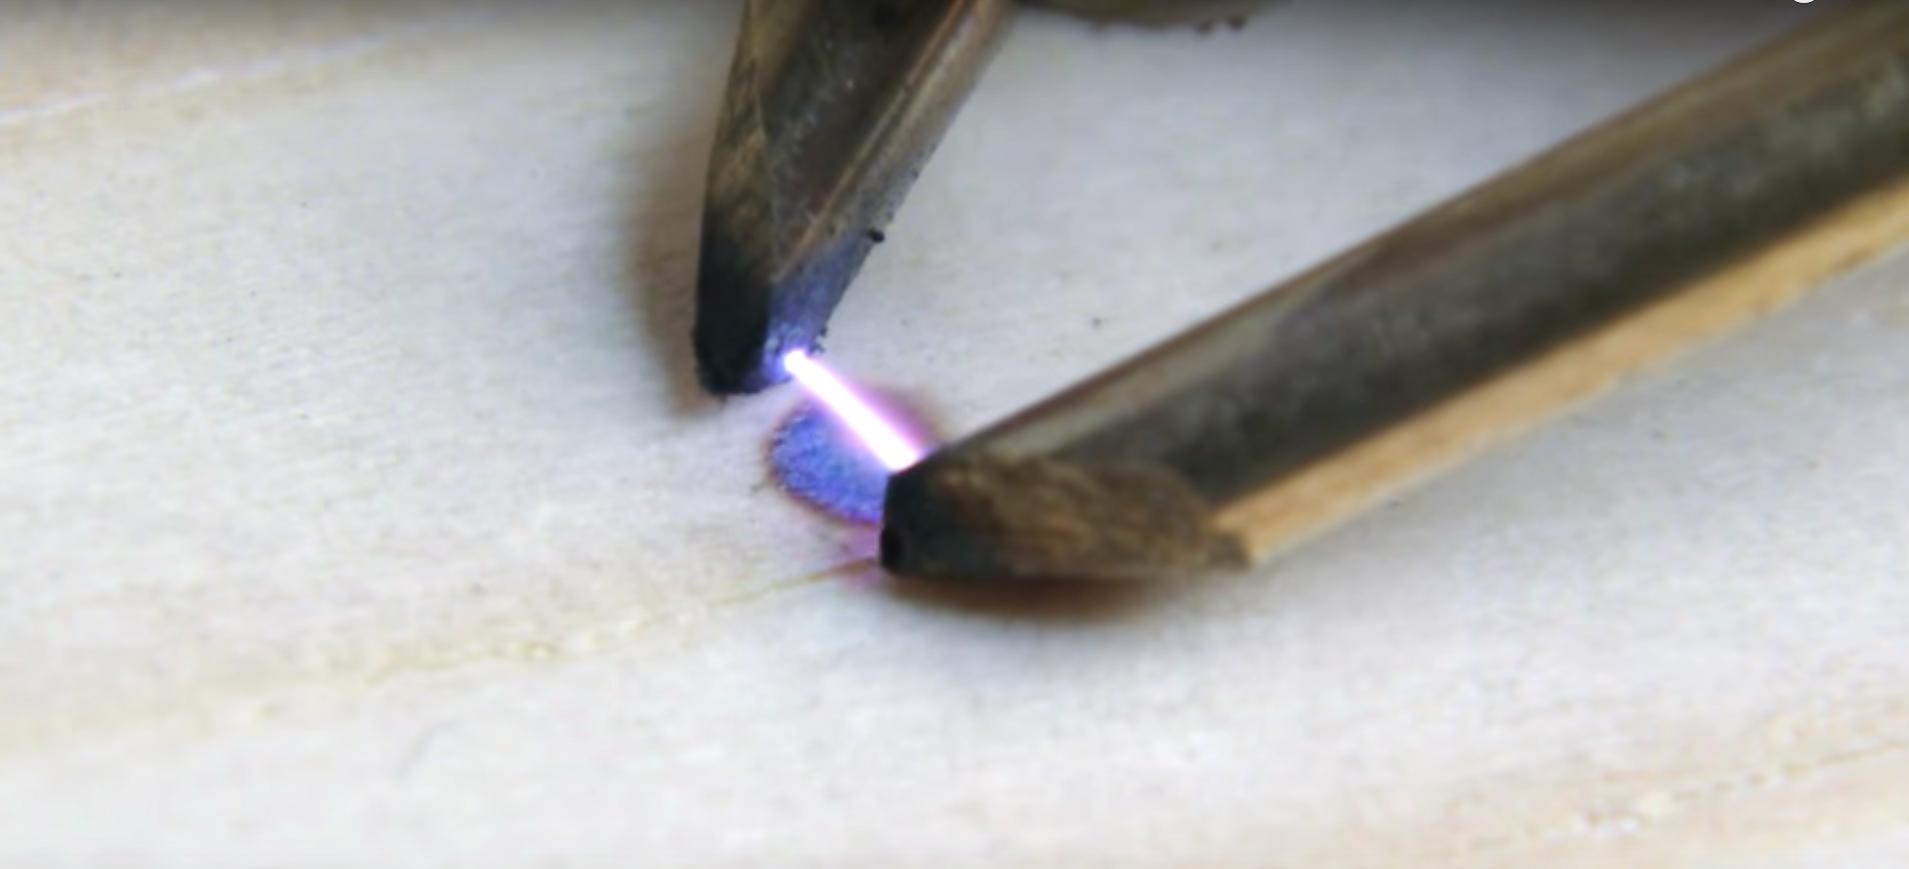 Arc Lighter Become Plasma Pyrography Pen | Hackaday